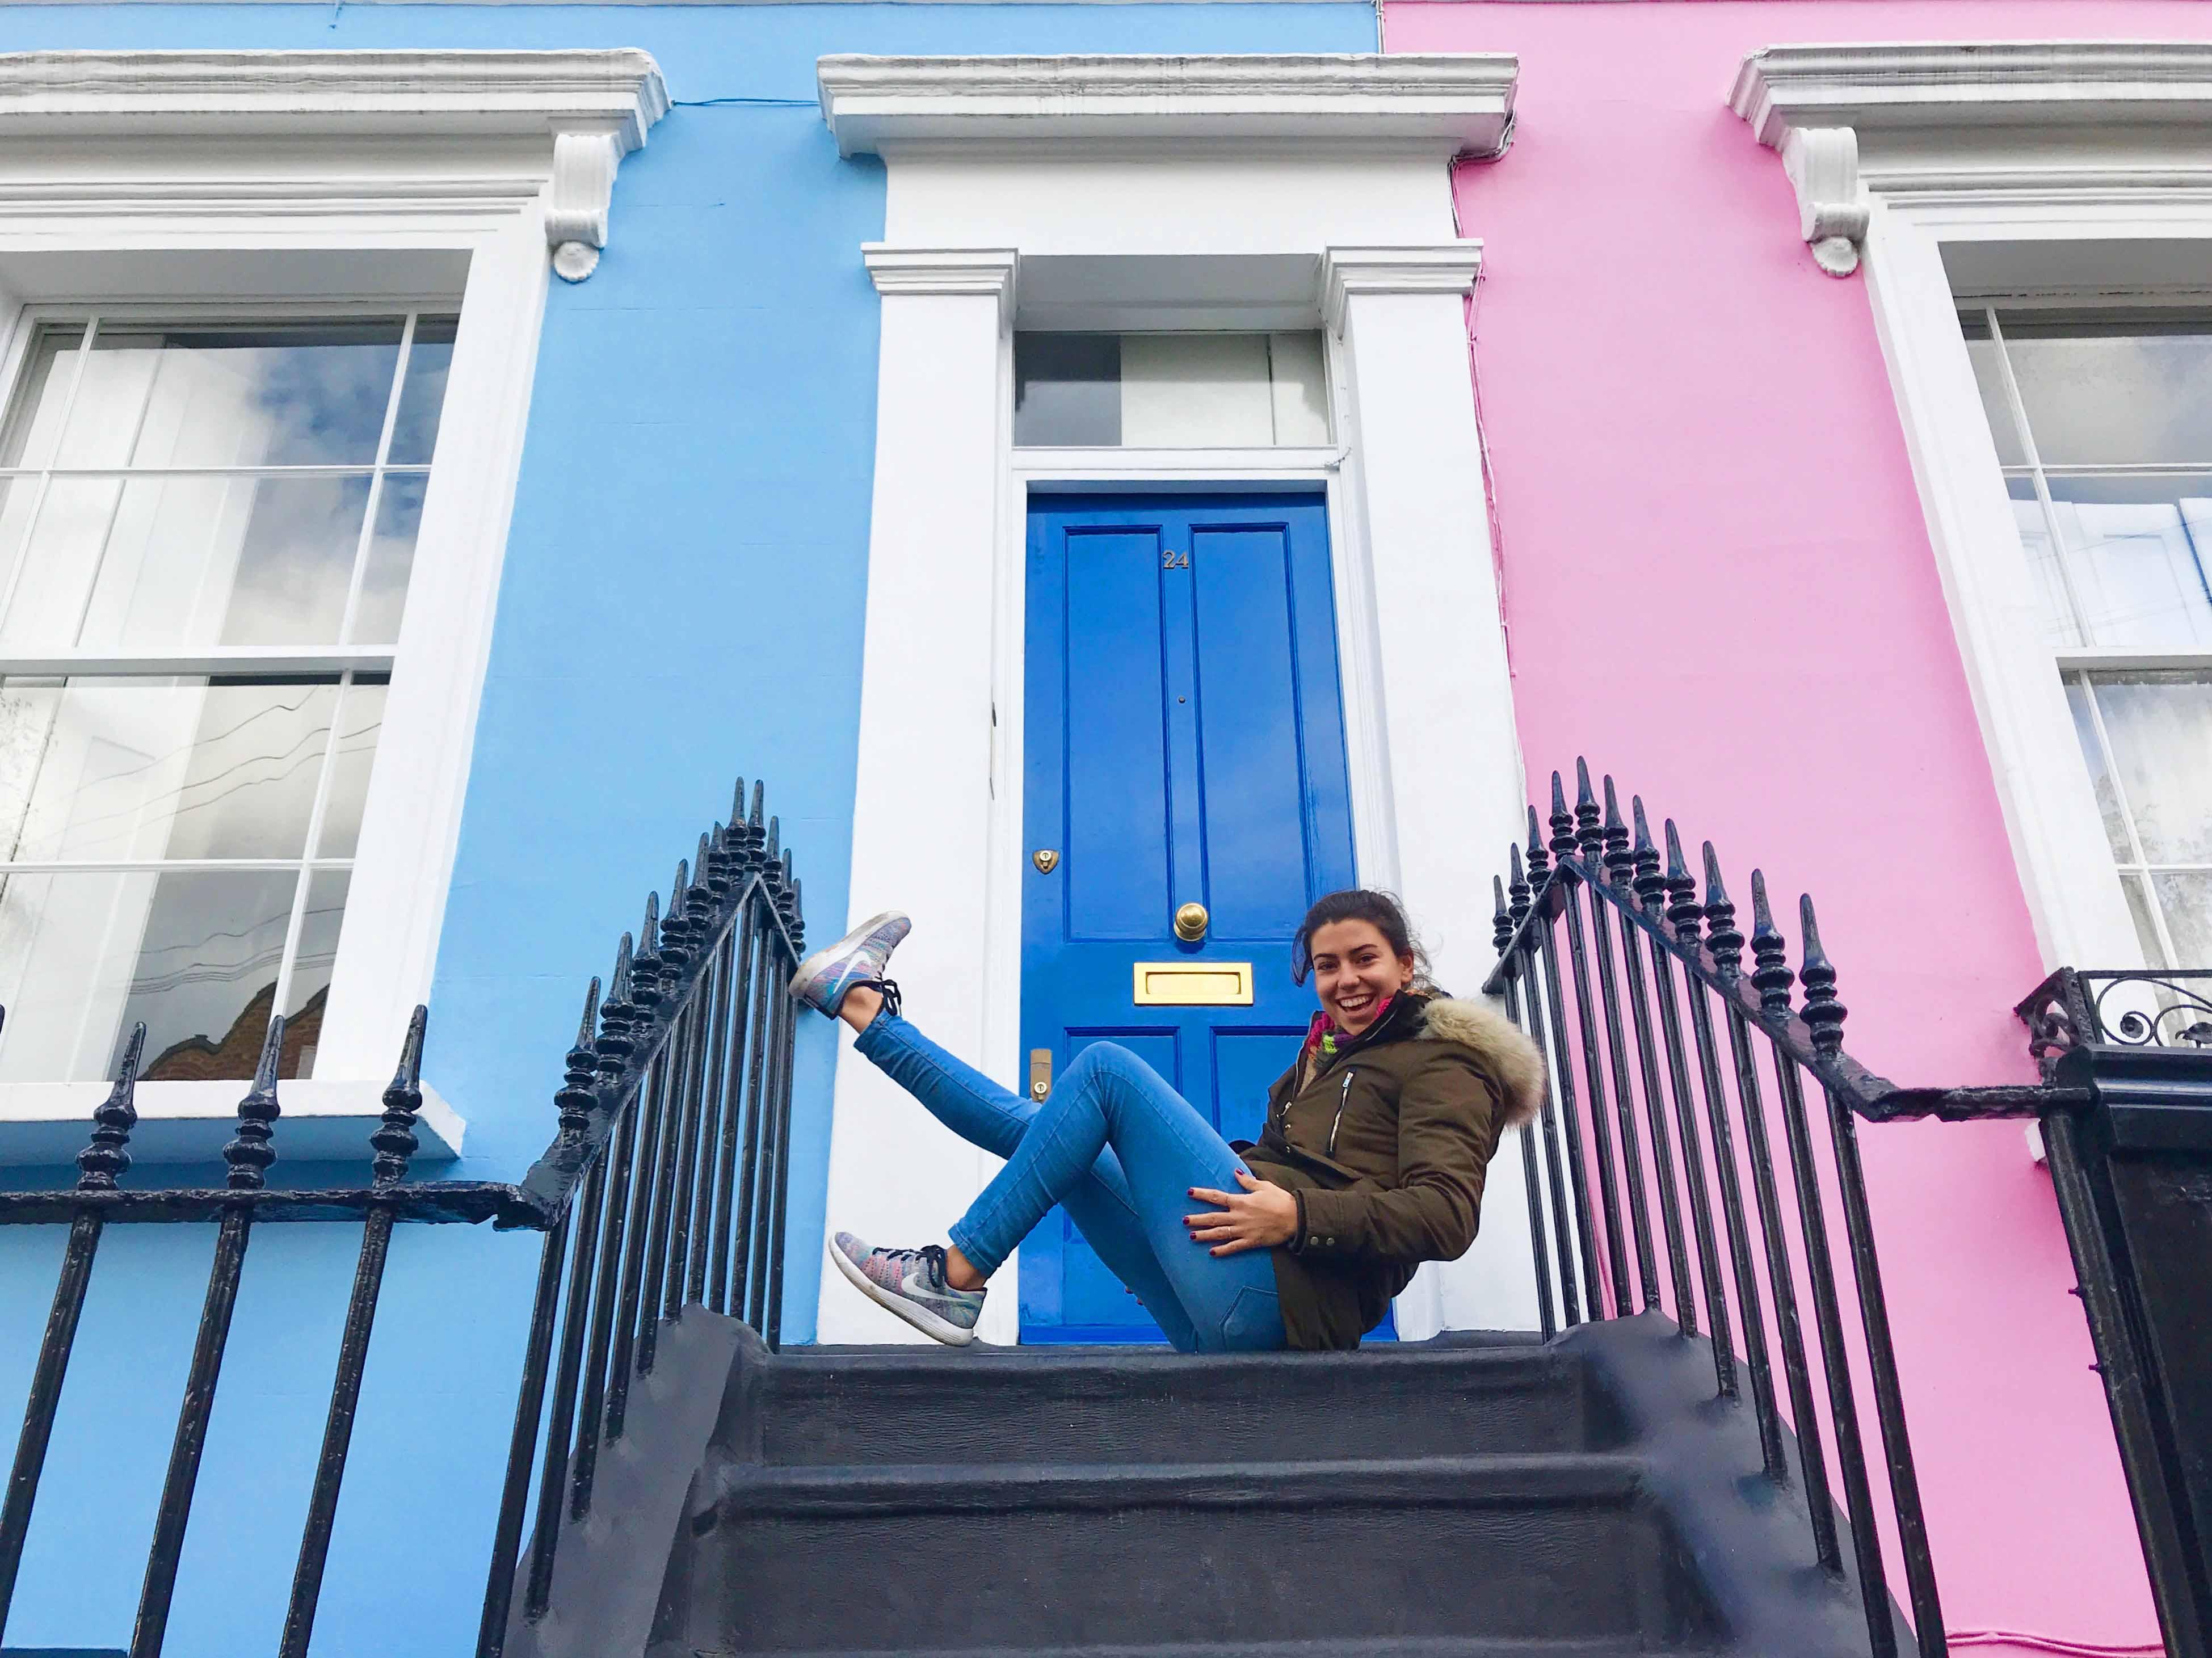 Londres mtraining minerva teaser